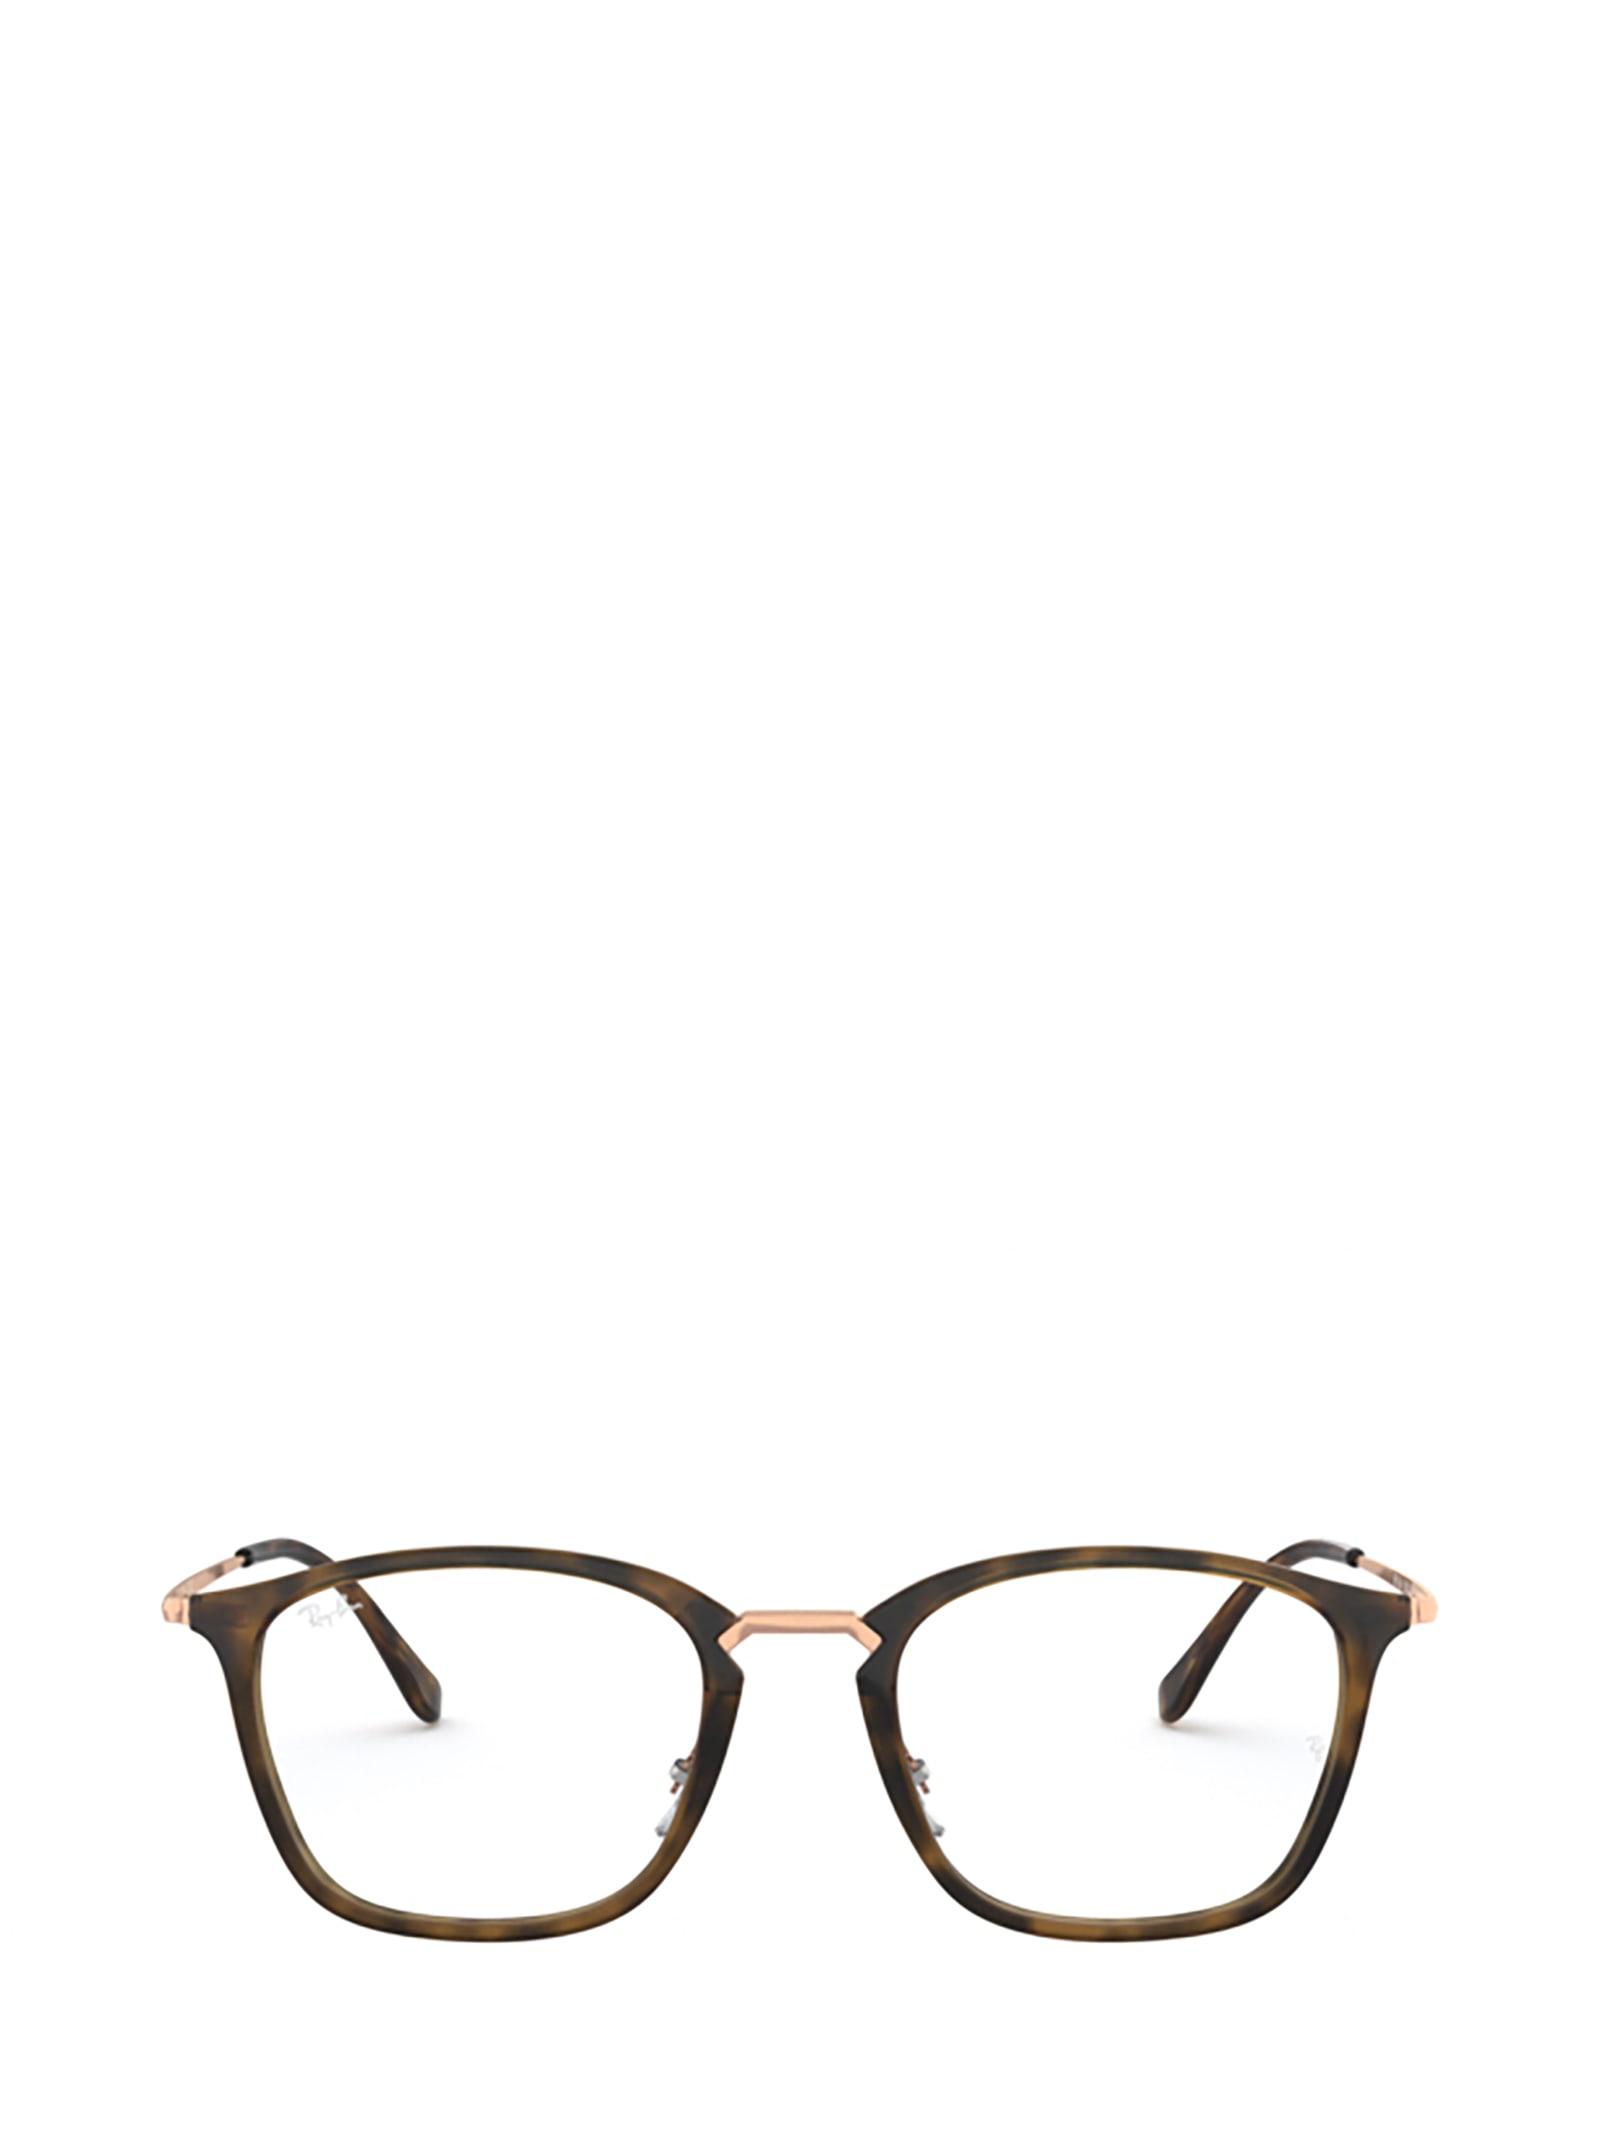 Ray-Ban Ray-ban Rx7164 Havana Glasses